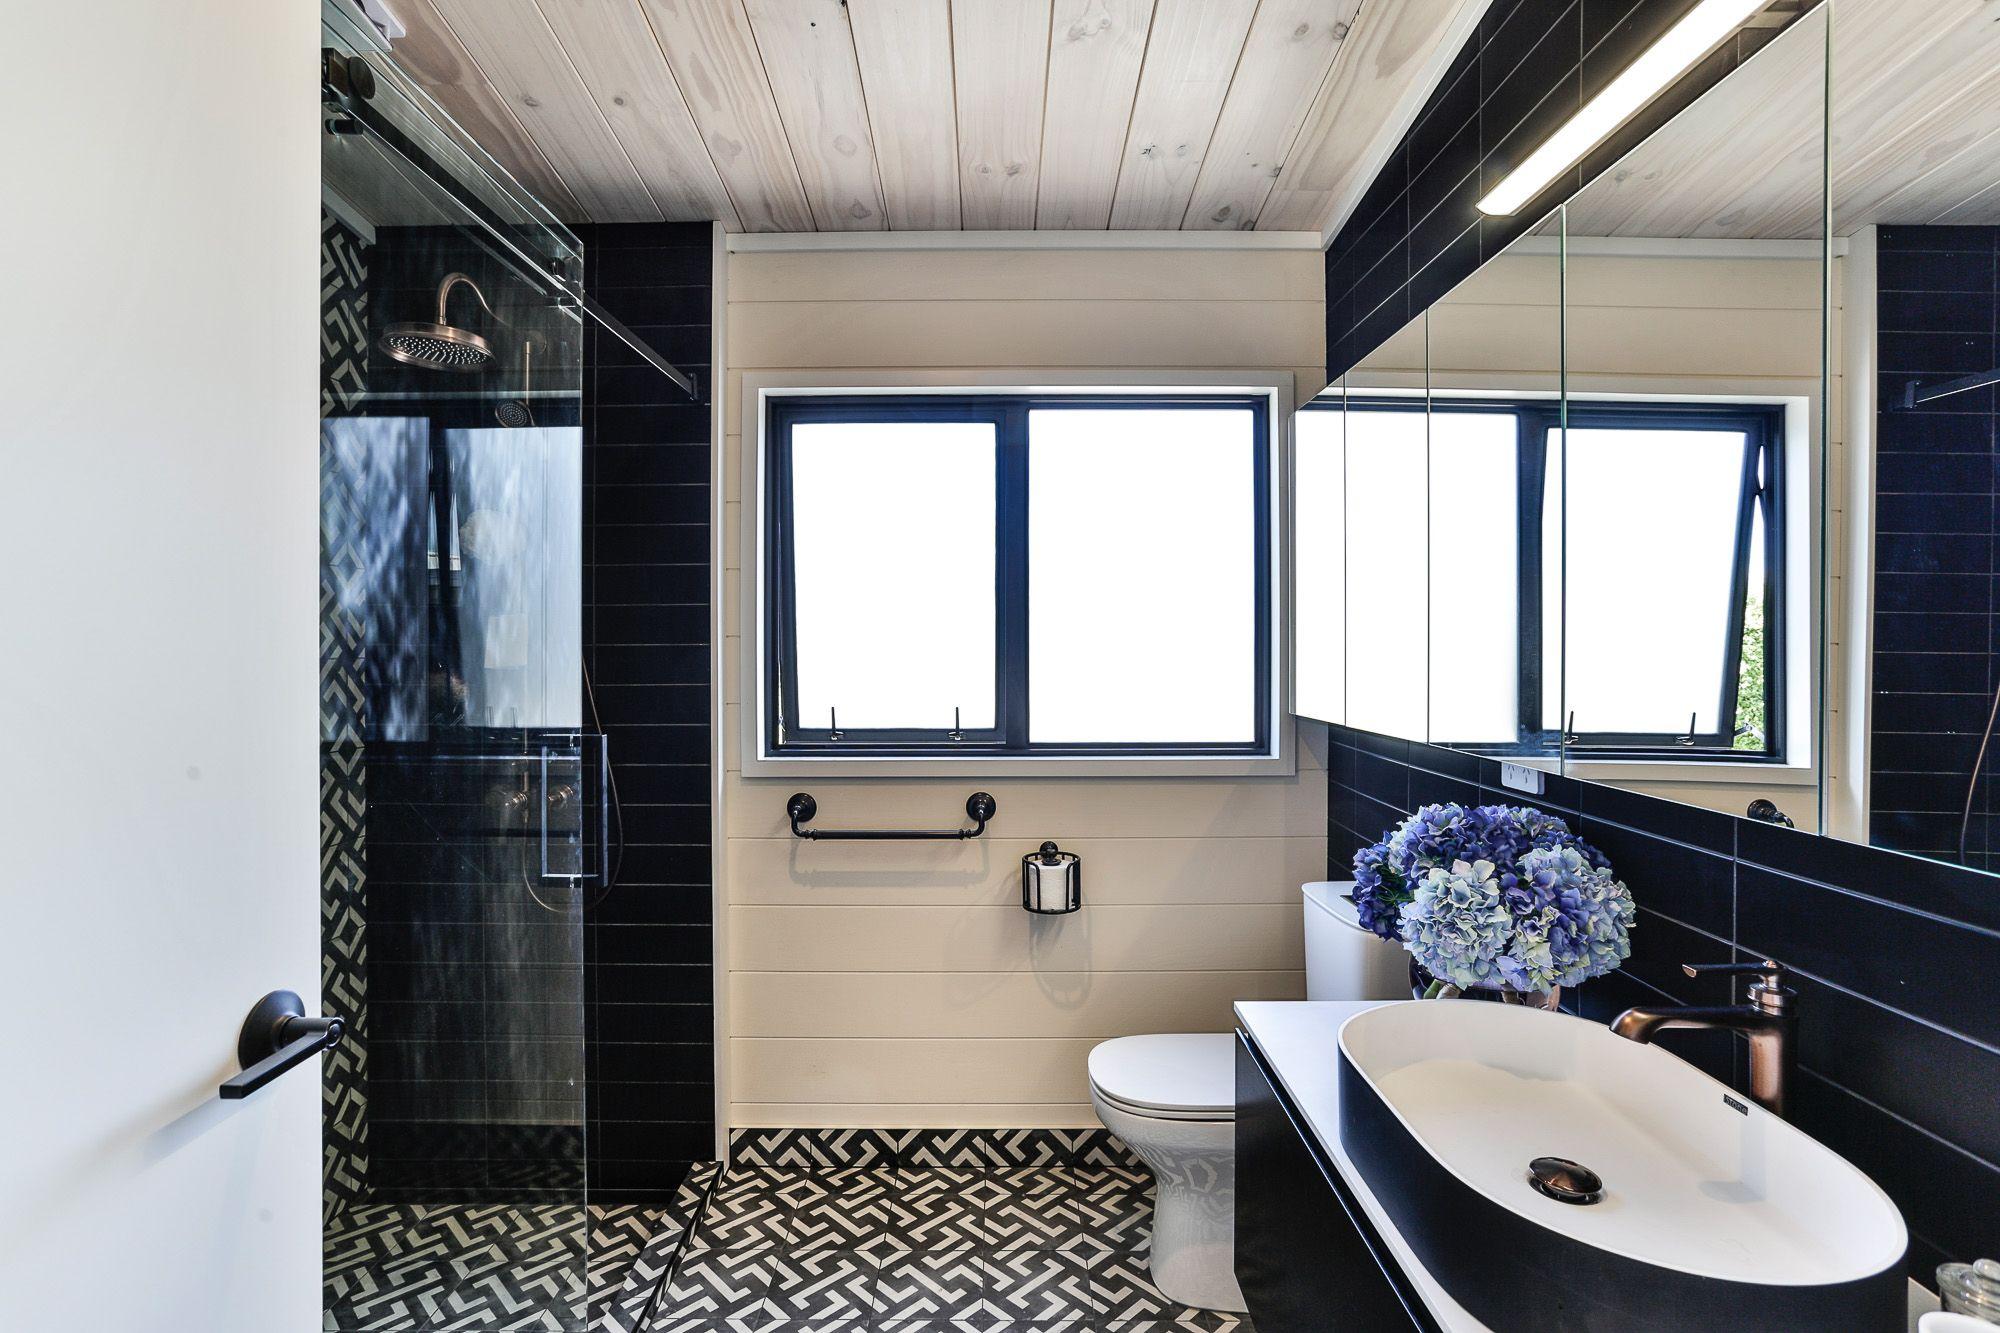 lockwood taupo bathroom with painted walls house design on bathroom renovation ideas nz id=61688